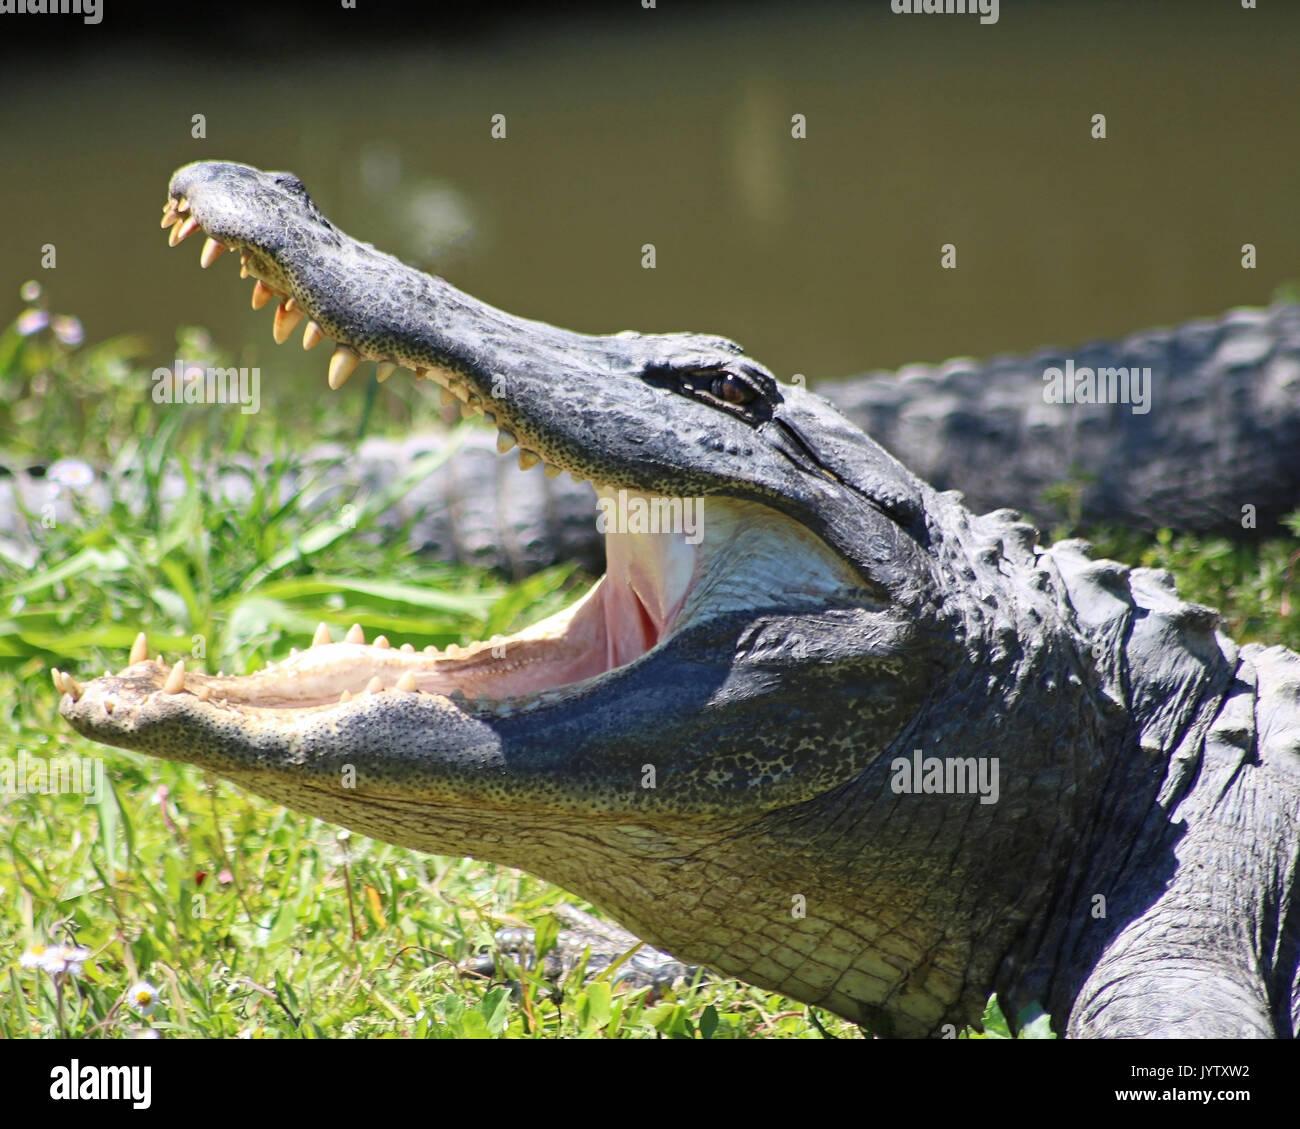 Krokodil in geöffneter Mund Stockbild